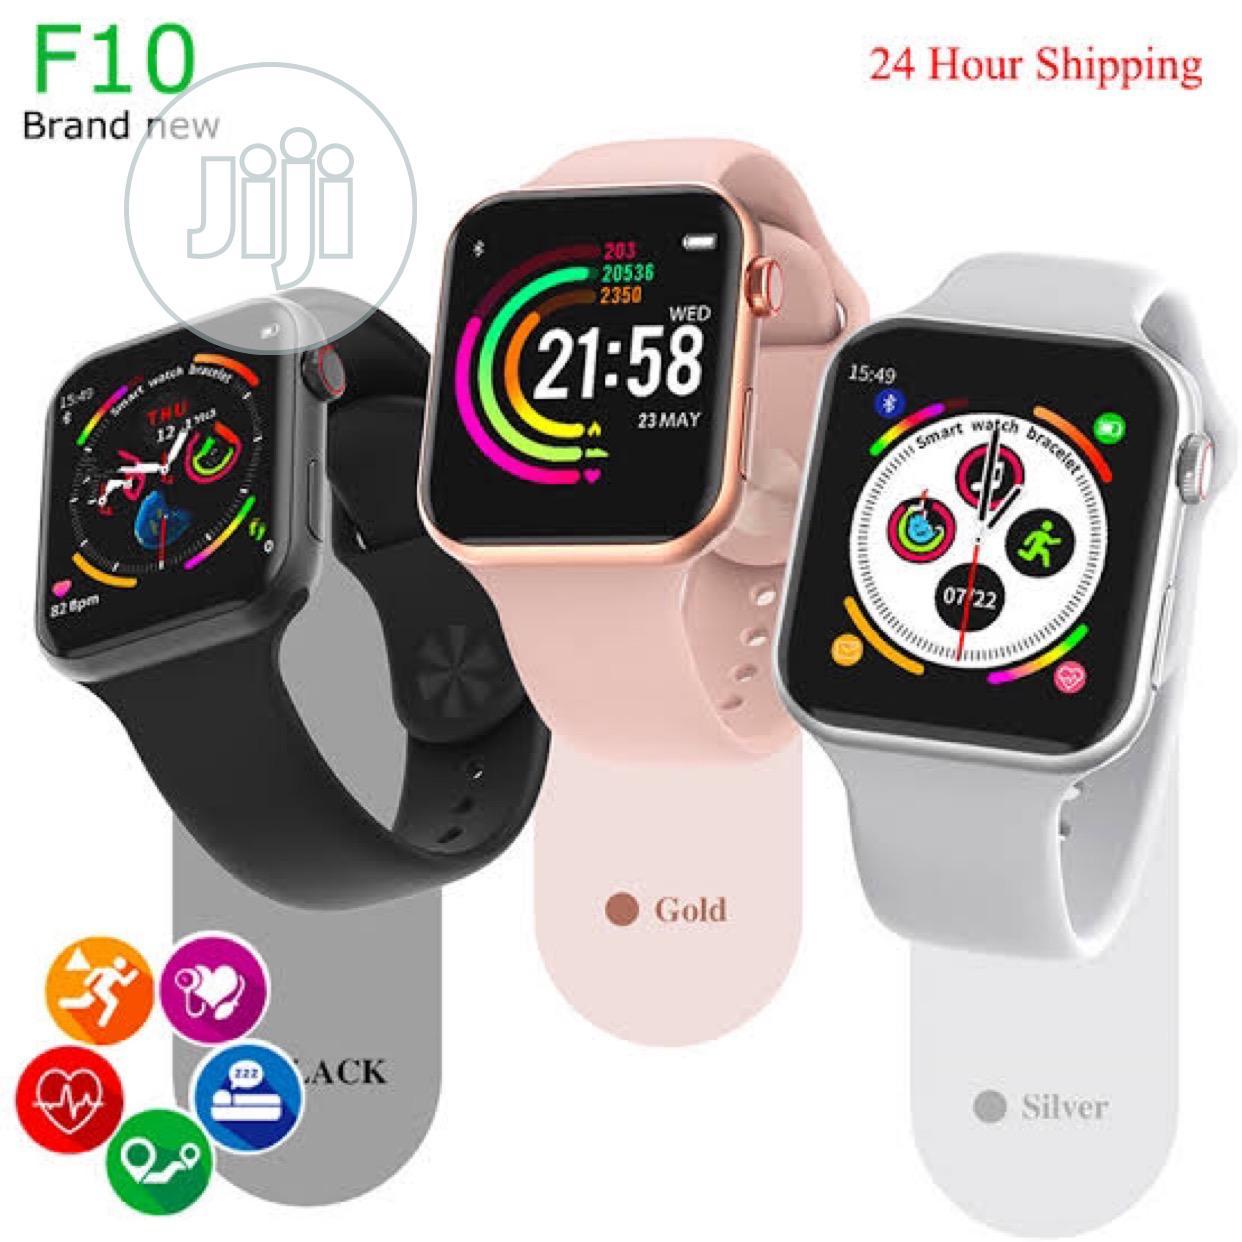 F10 Smart Watch, Fitness Tracker,HR Monitor